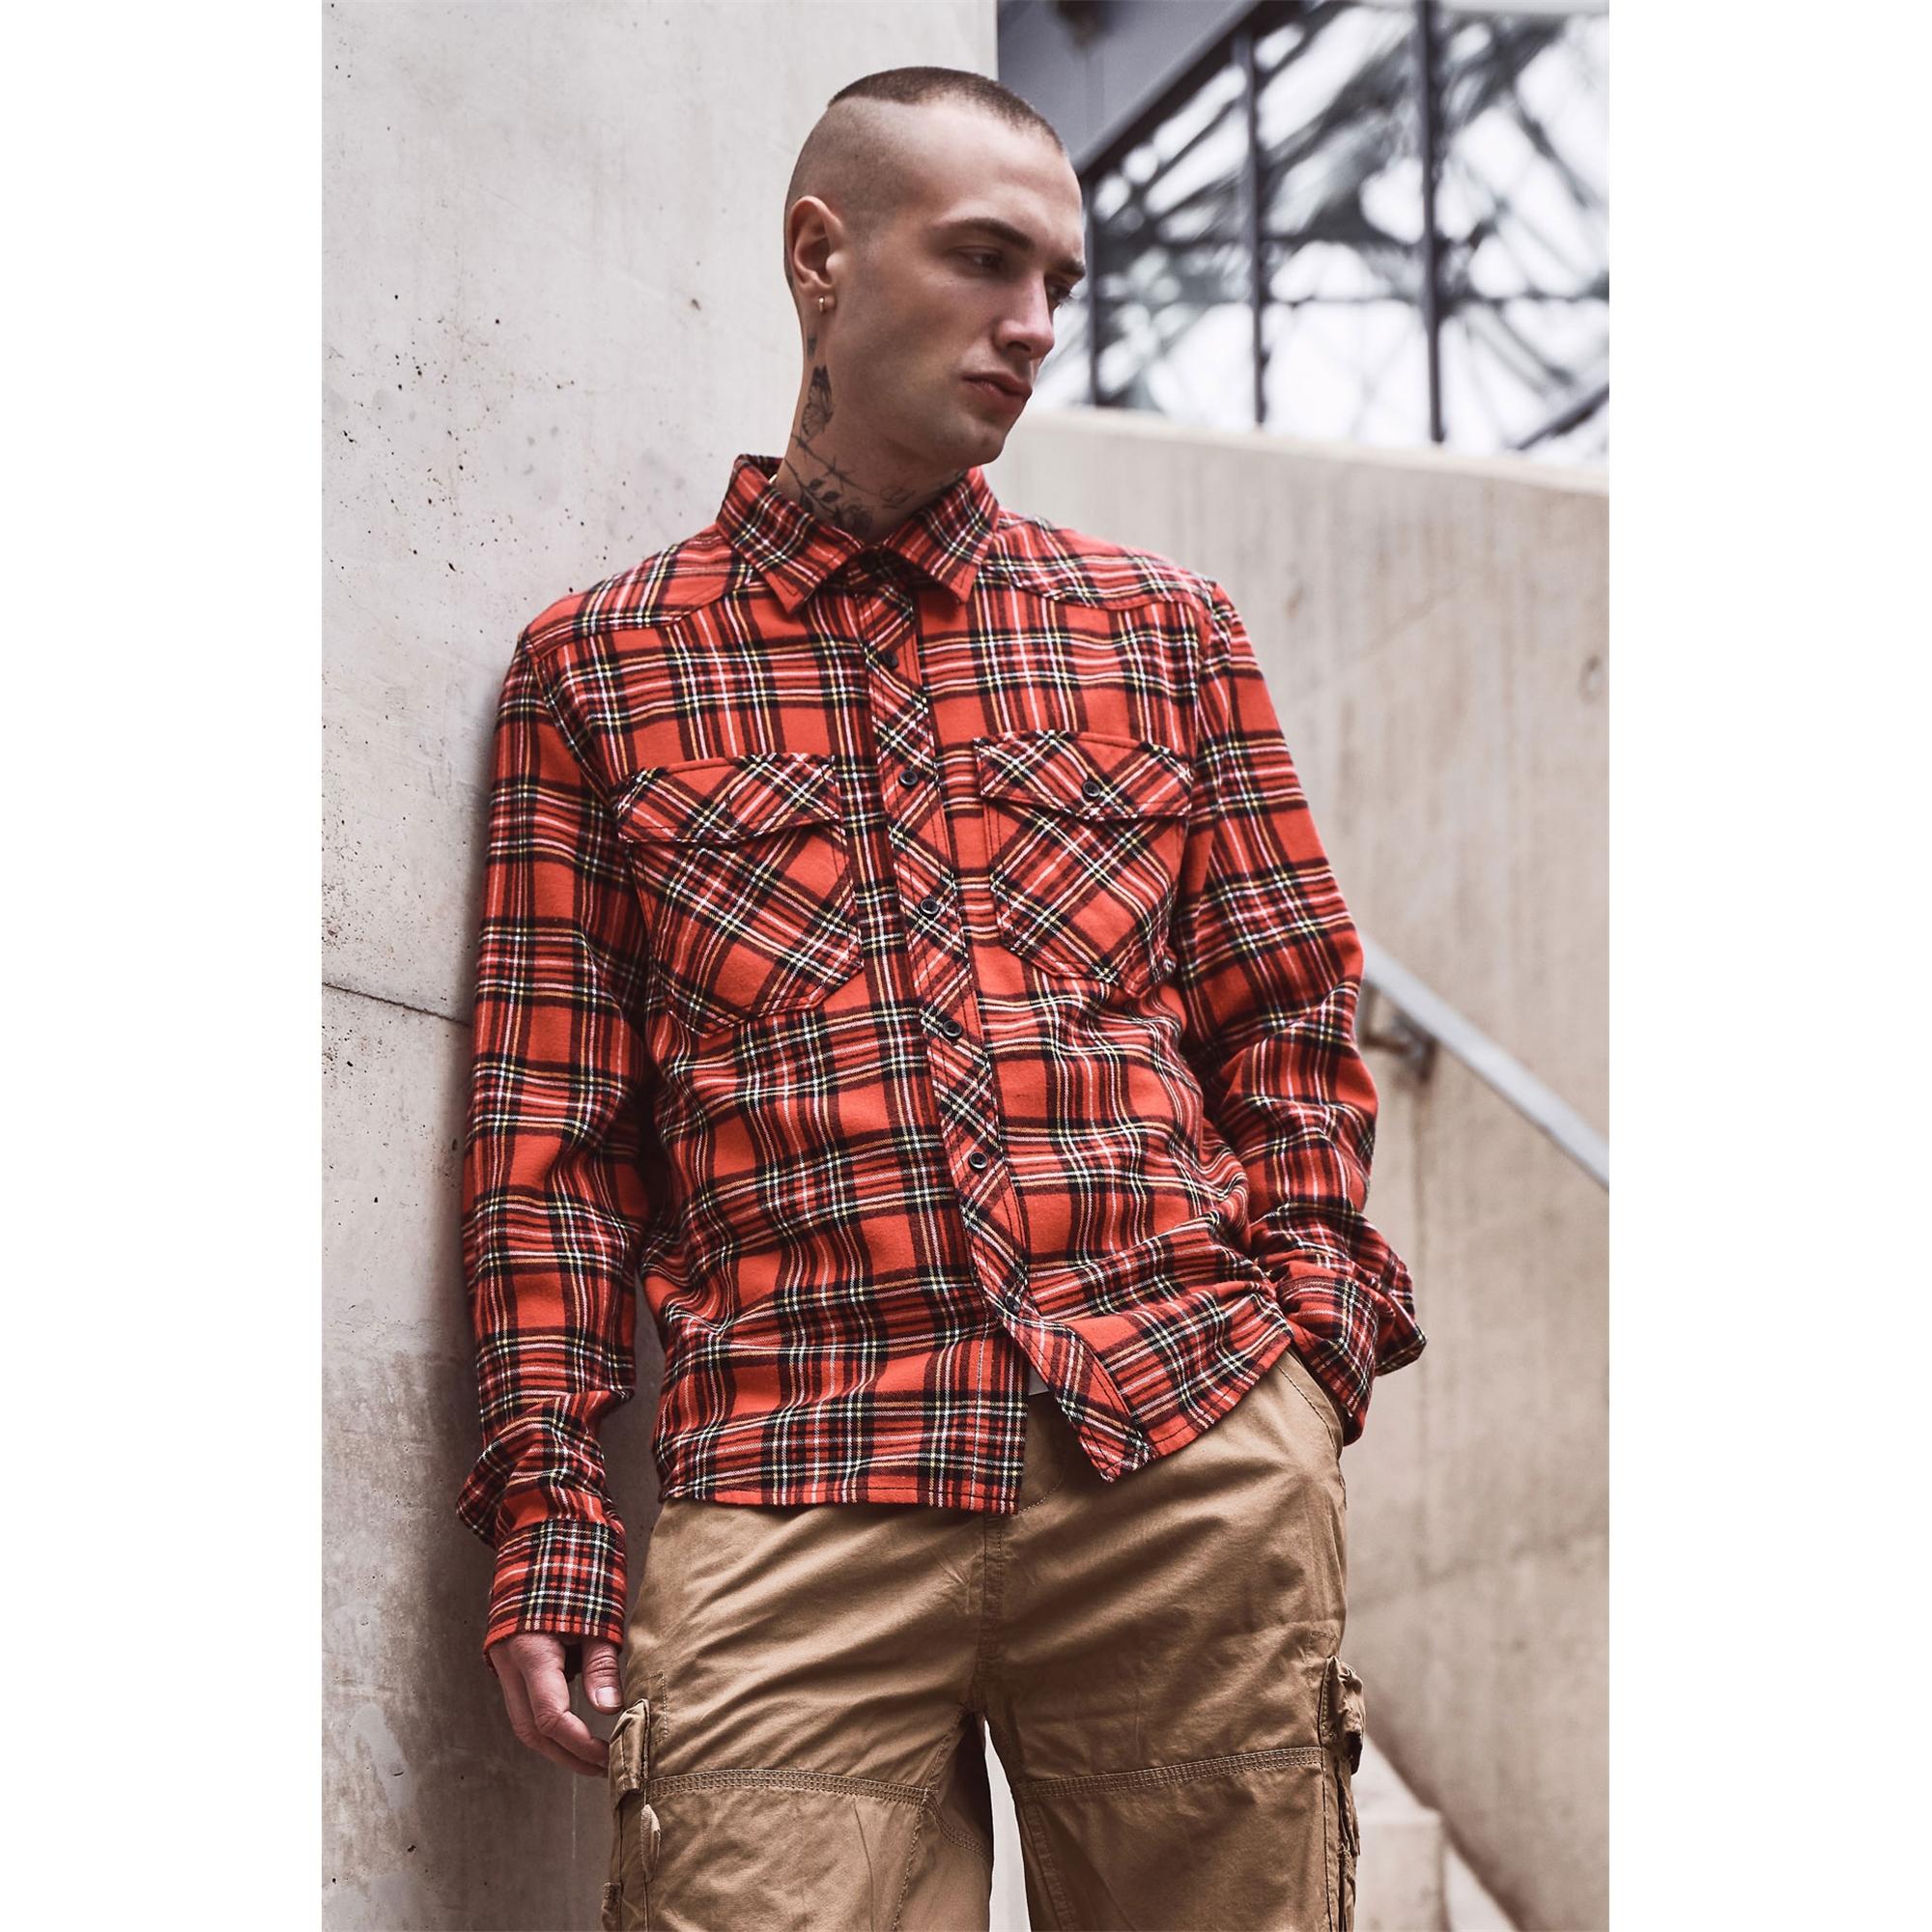 Indexbild 11 - Brandit Check Shirt Holzfäller Hemd Flanell Woodcutter Karo Freizeithemd S-7XL